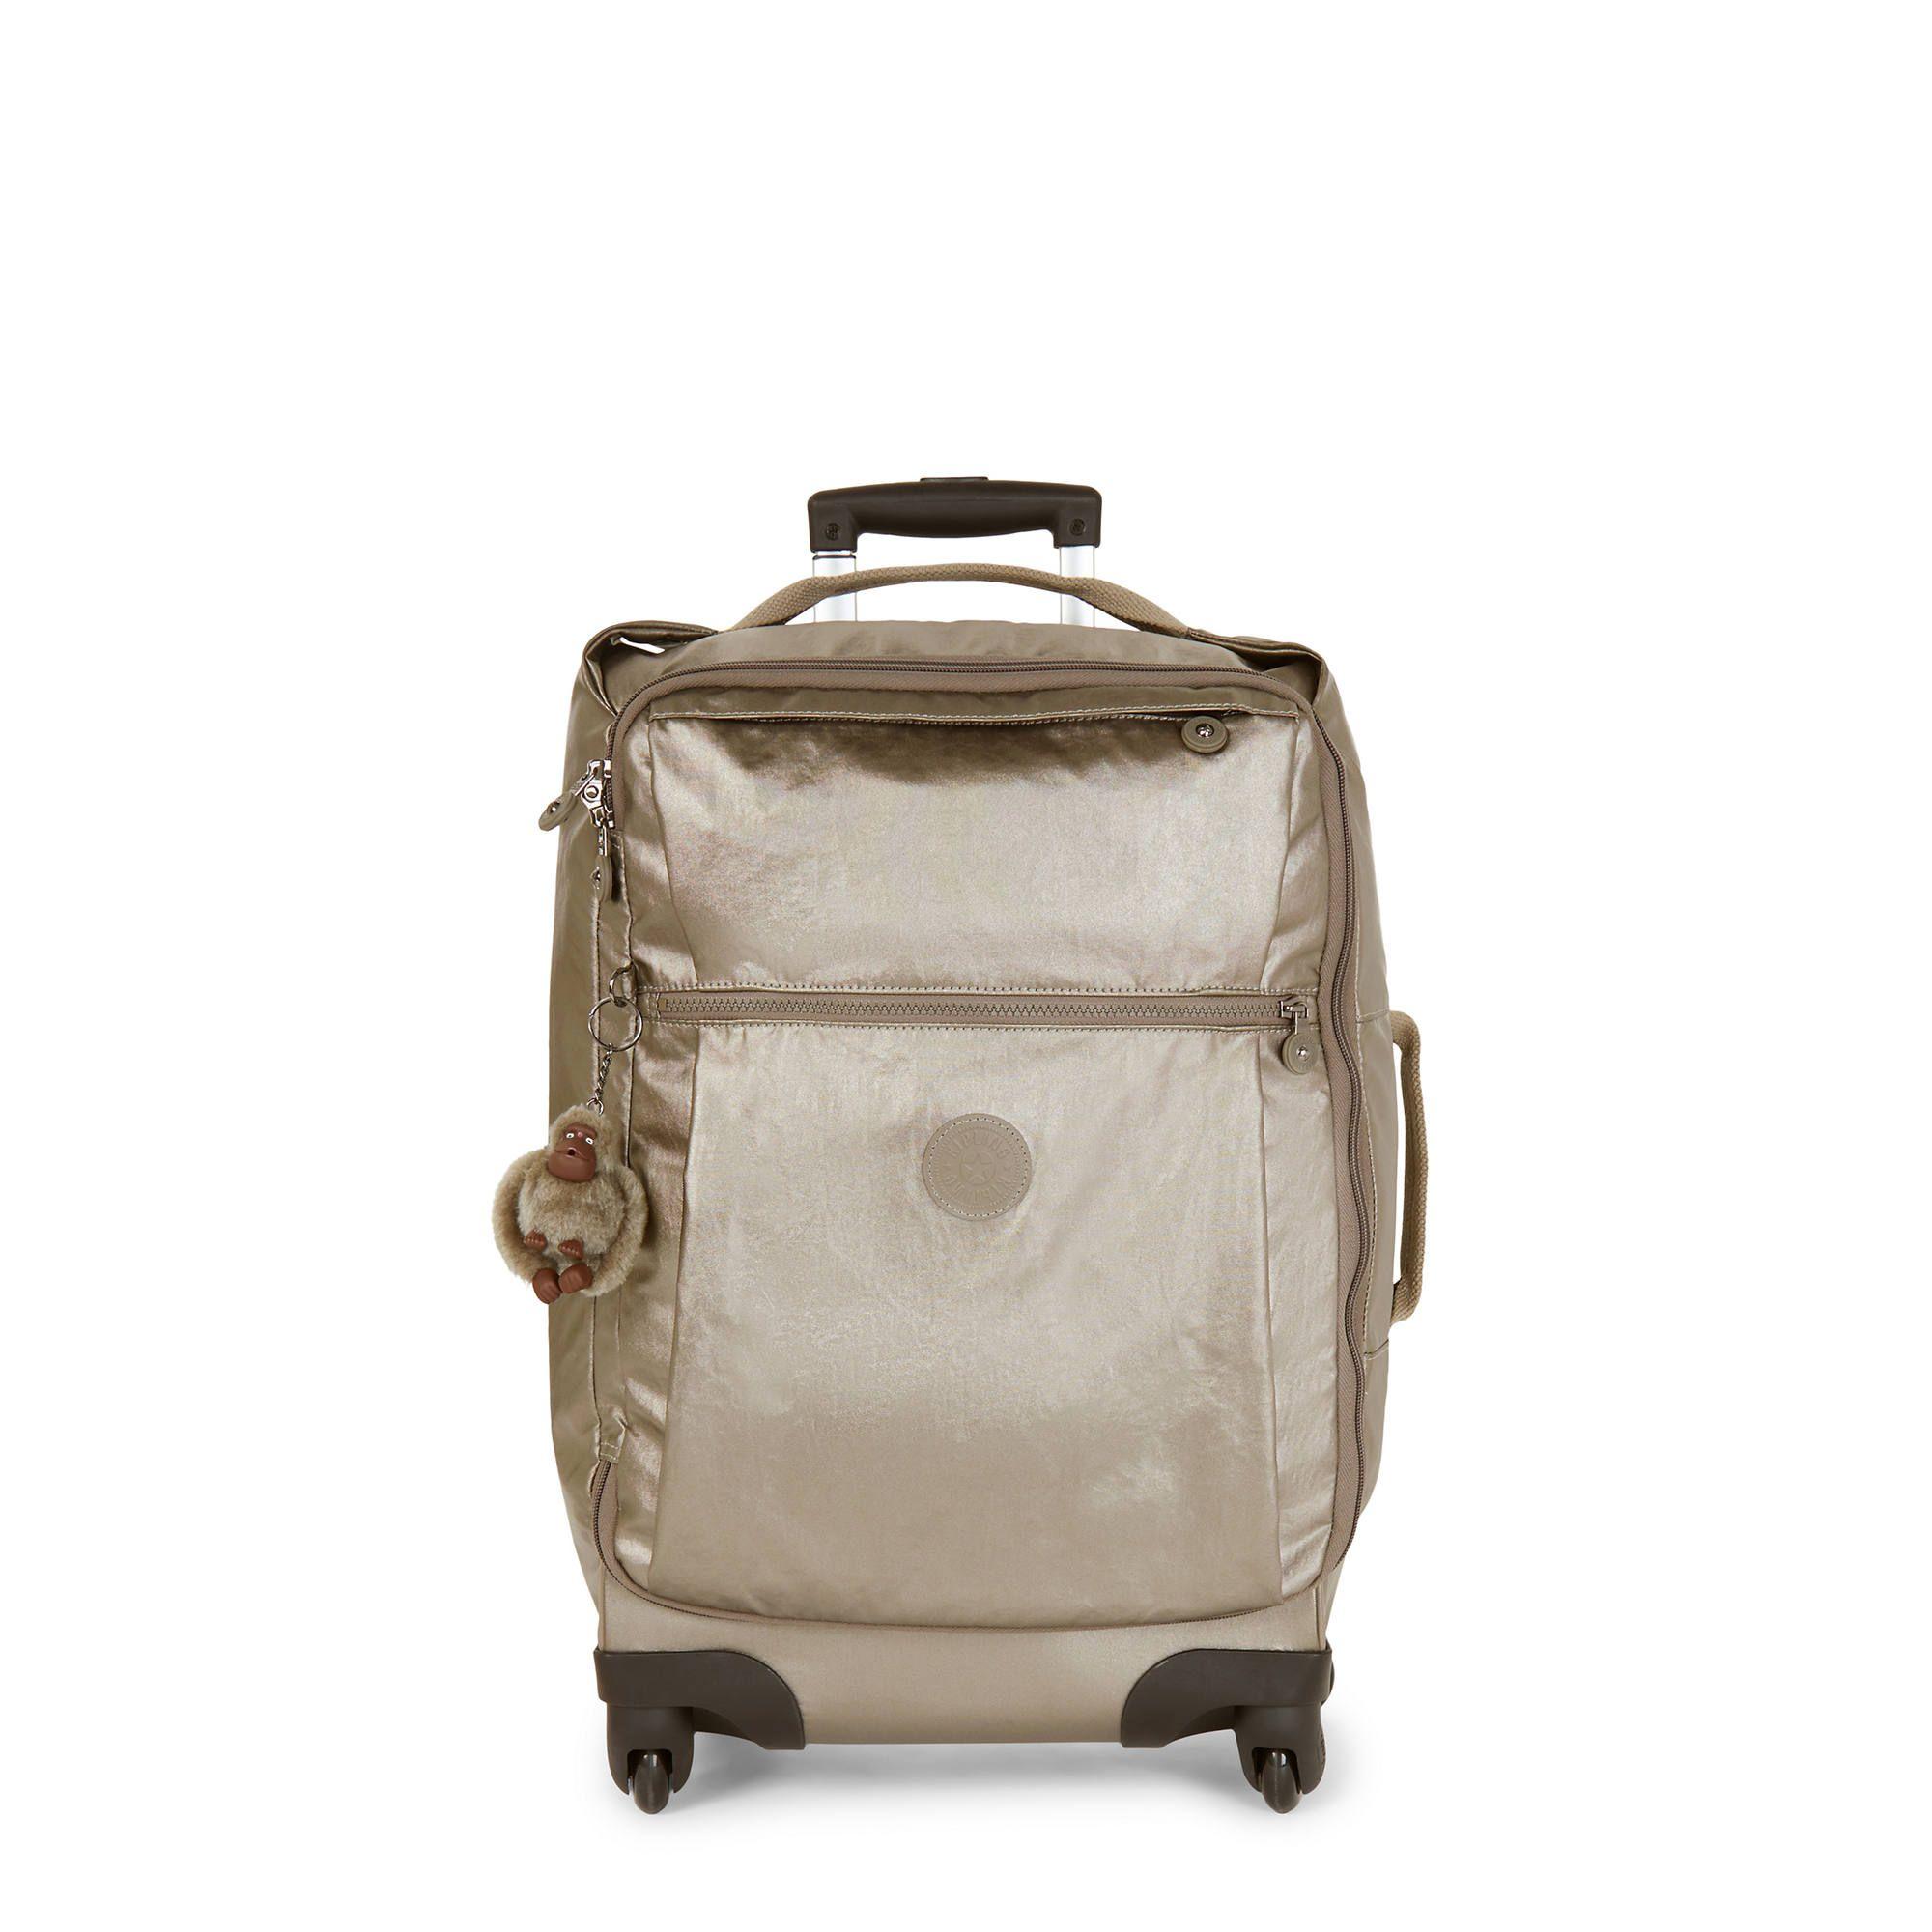 aa1e85ee2c Darcey Small Metallic Carry-on Rolling Luggage